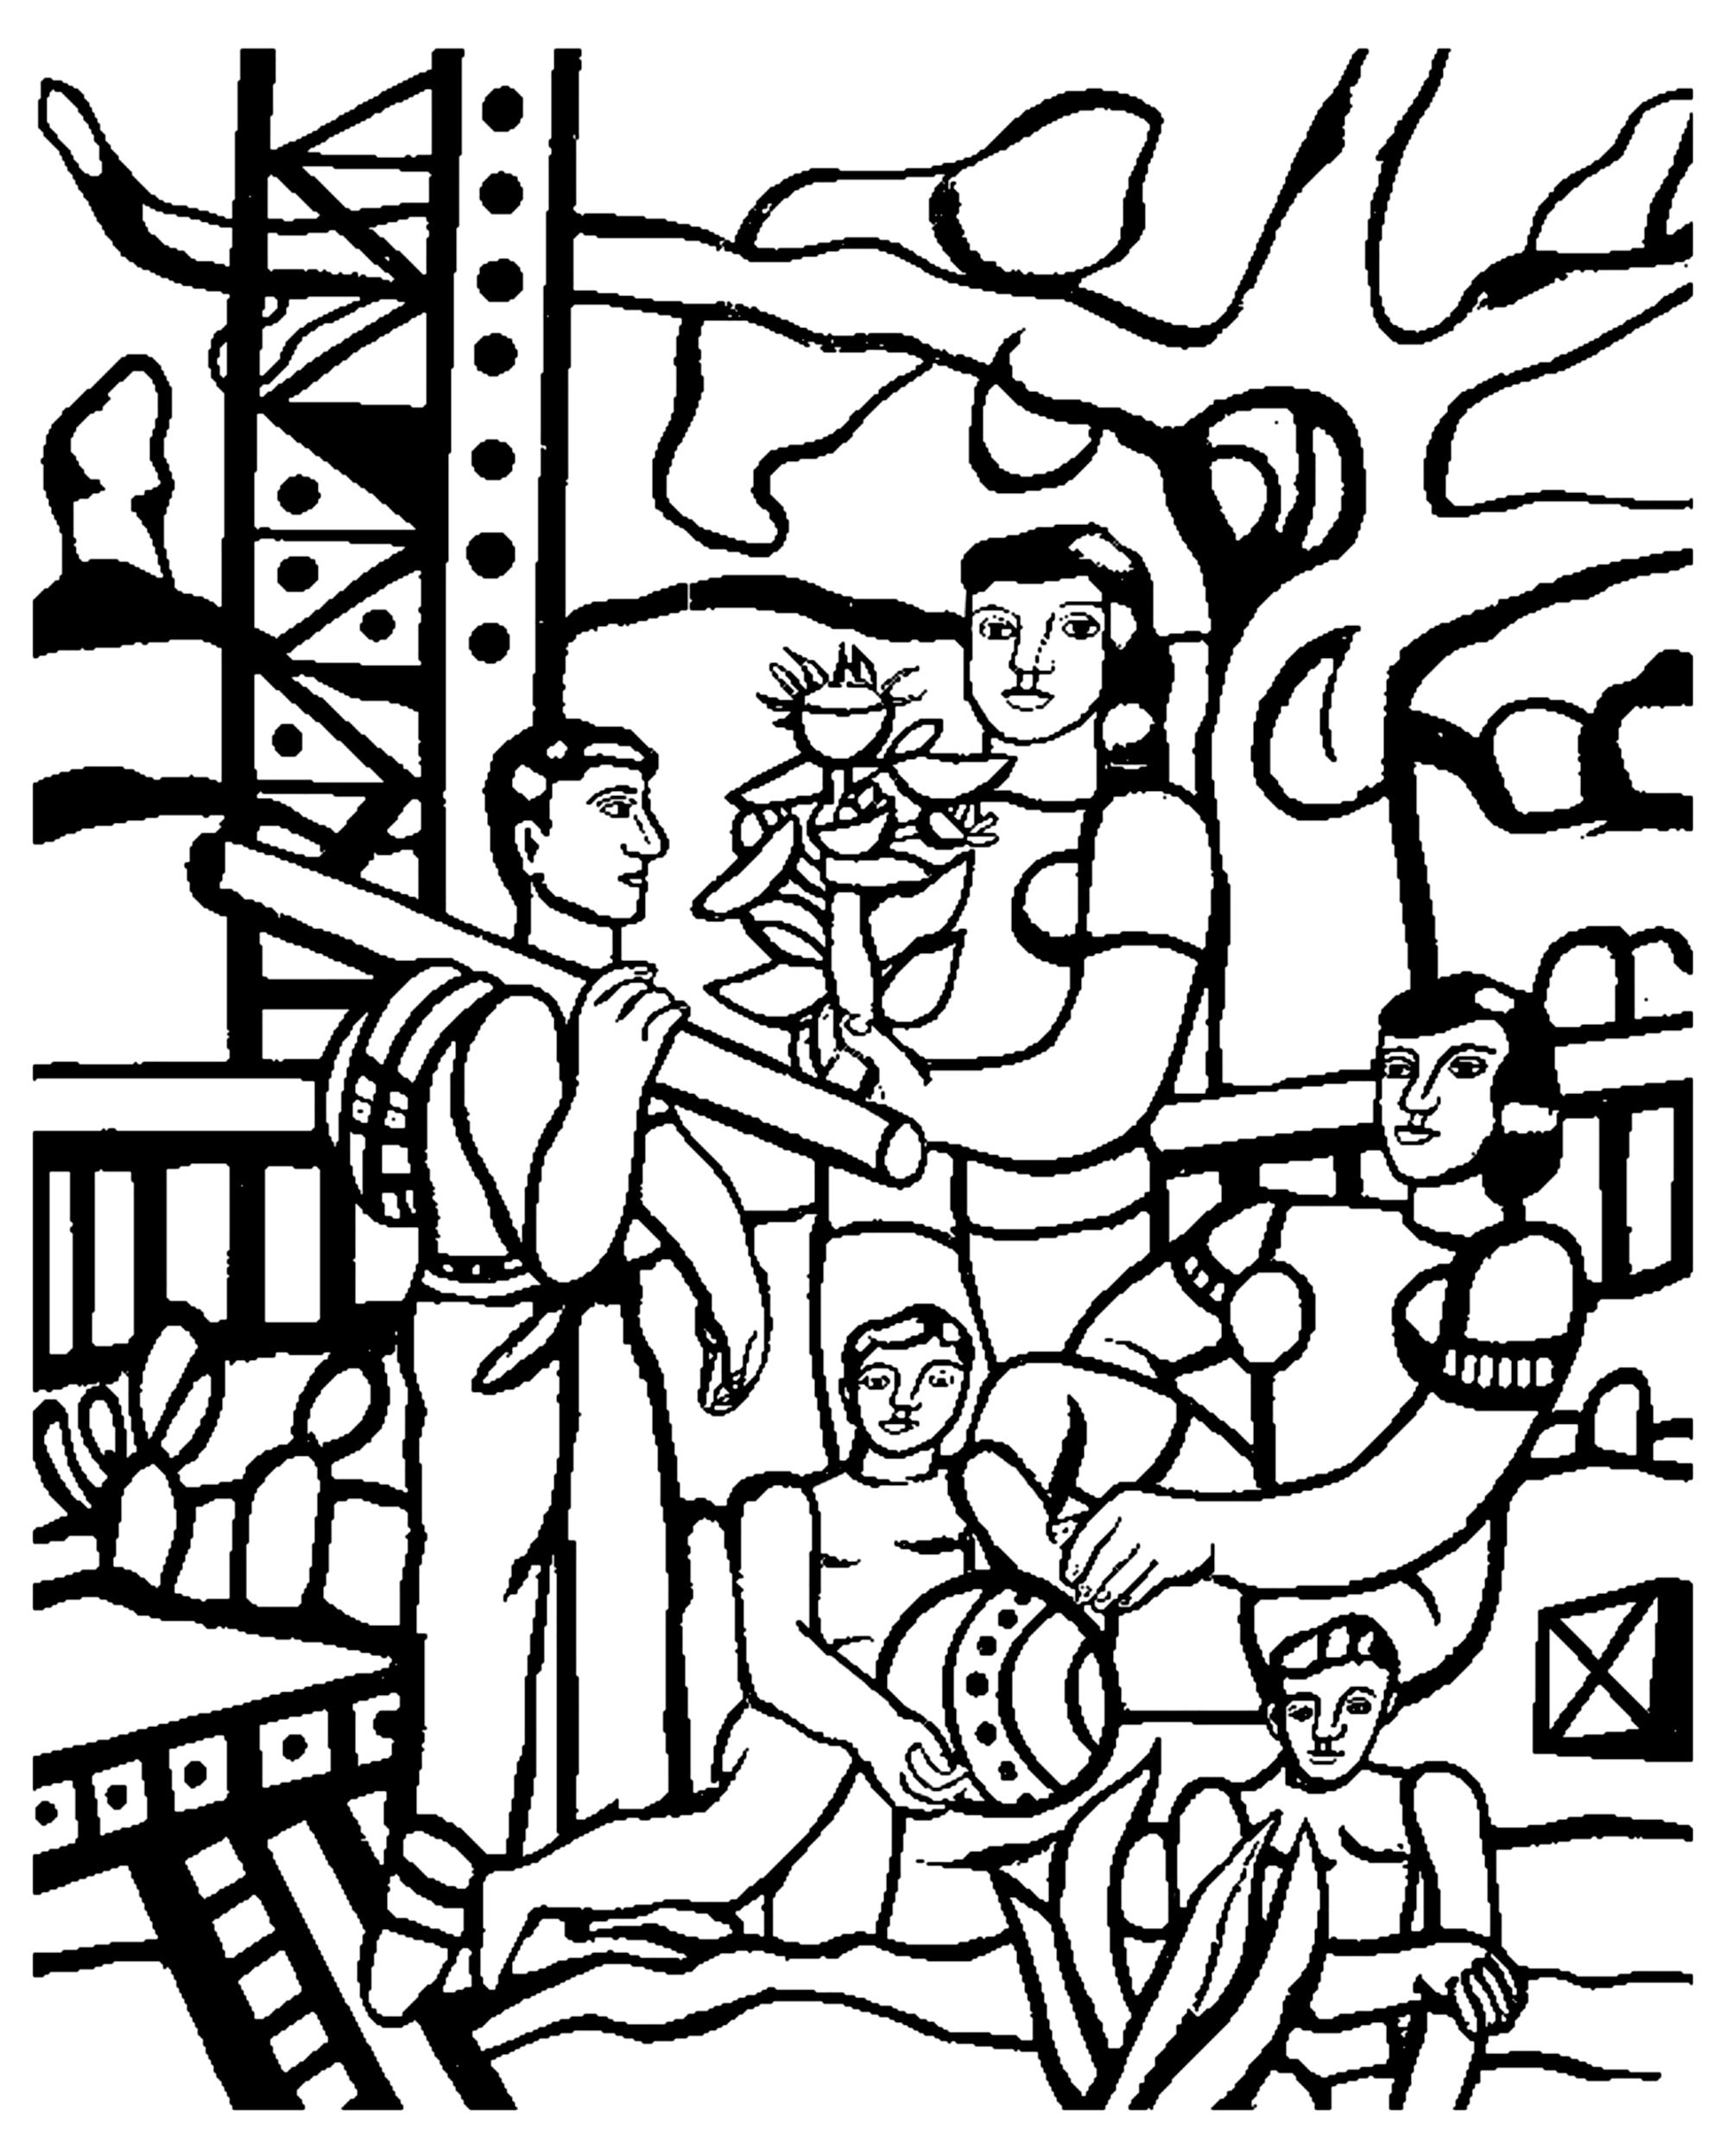 Colorear para adultos  : Obra de arte - 58